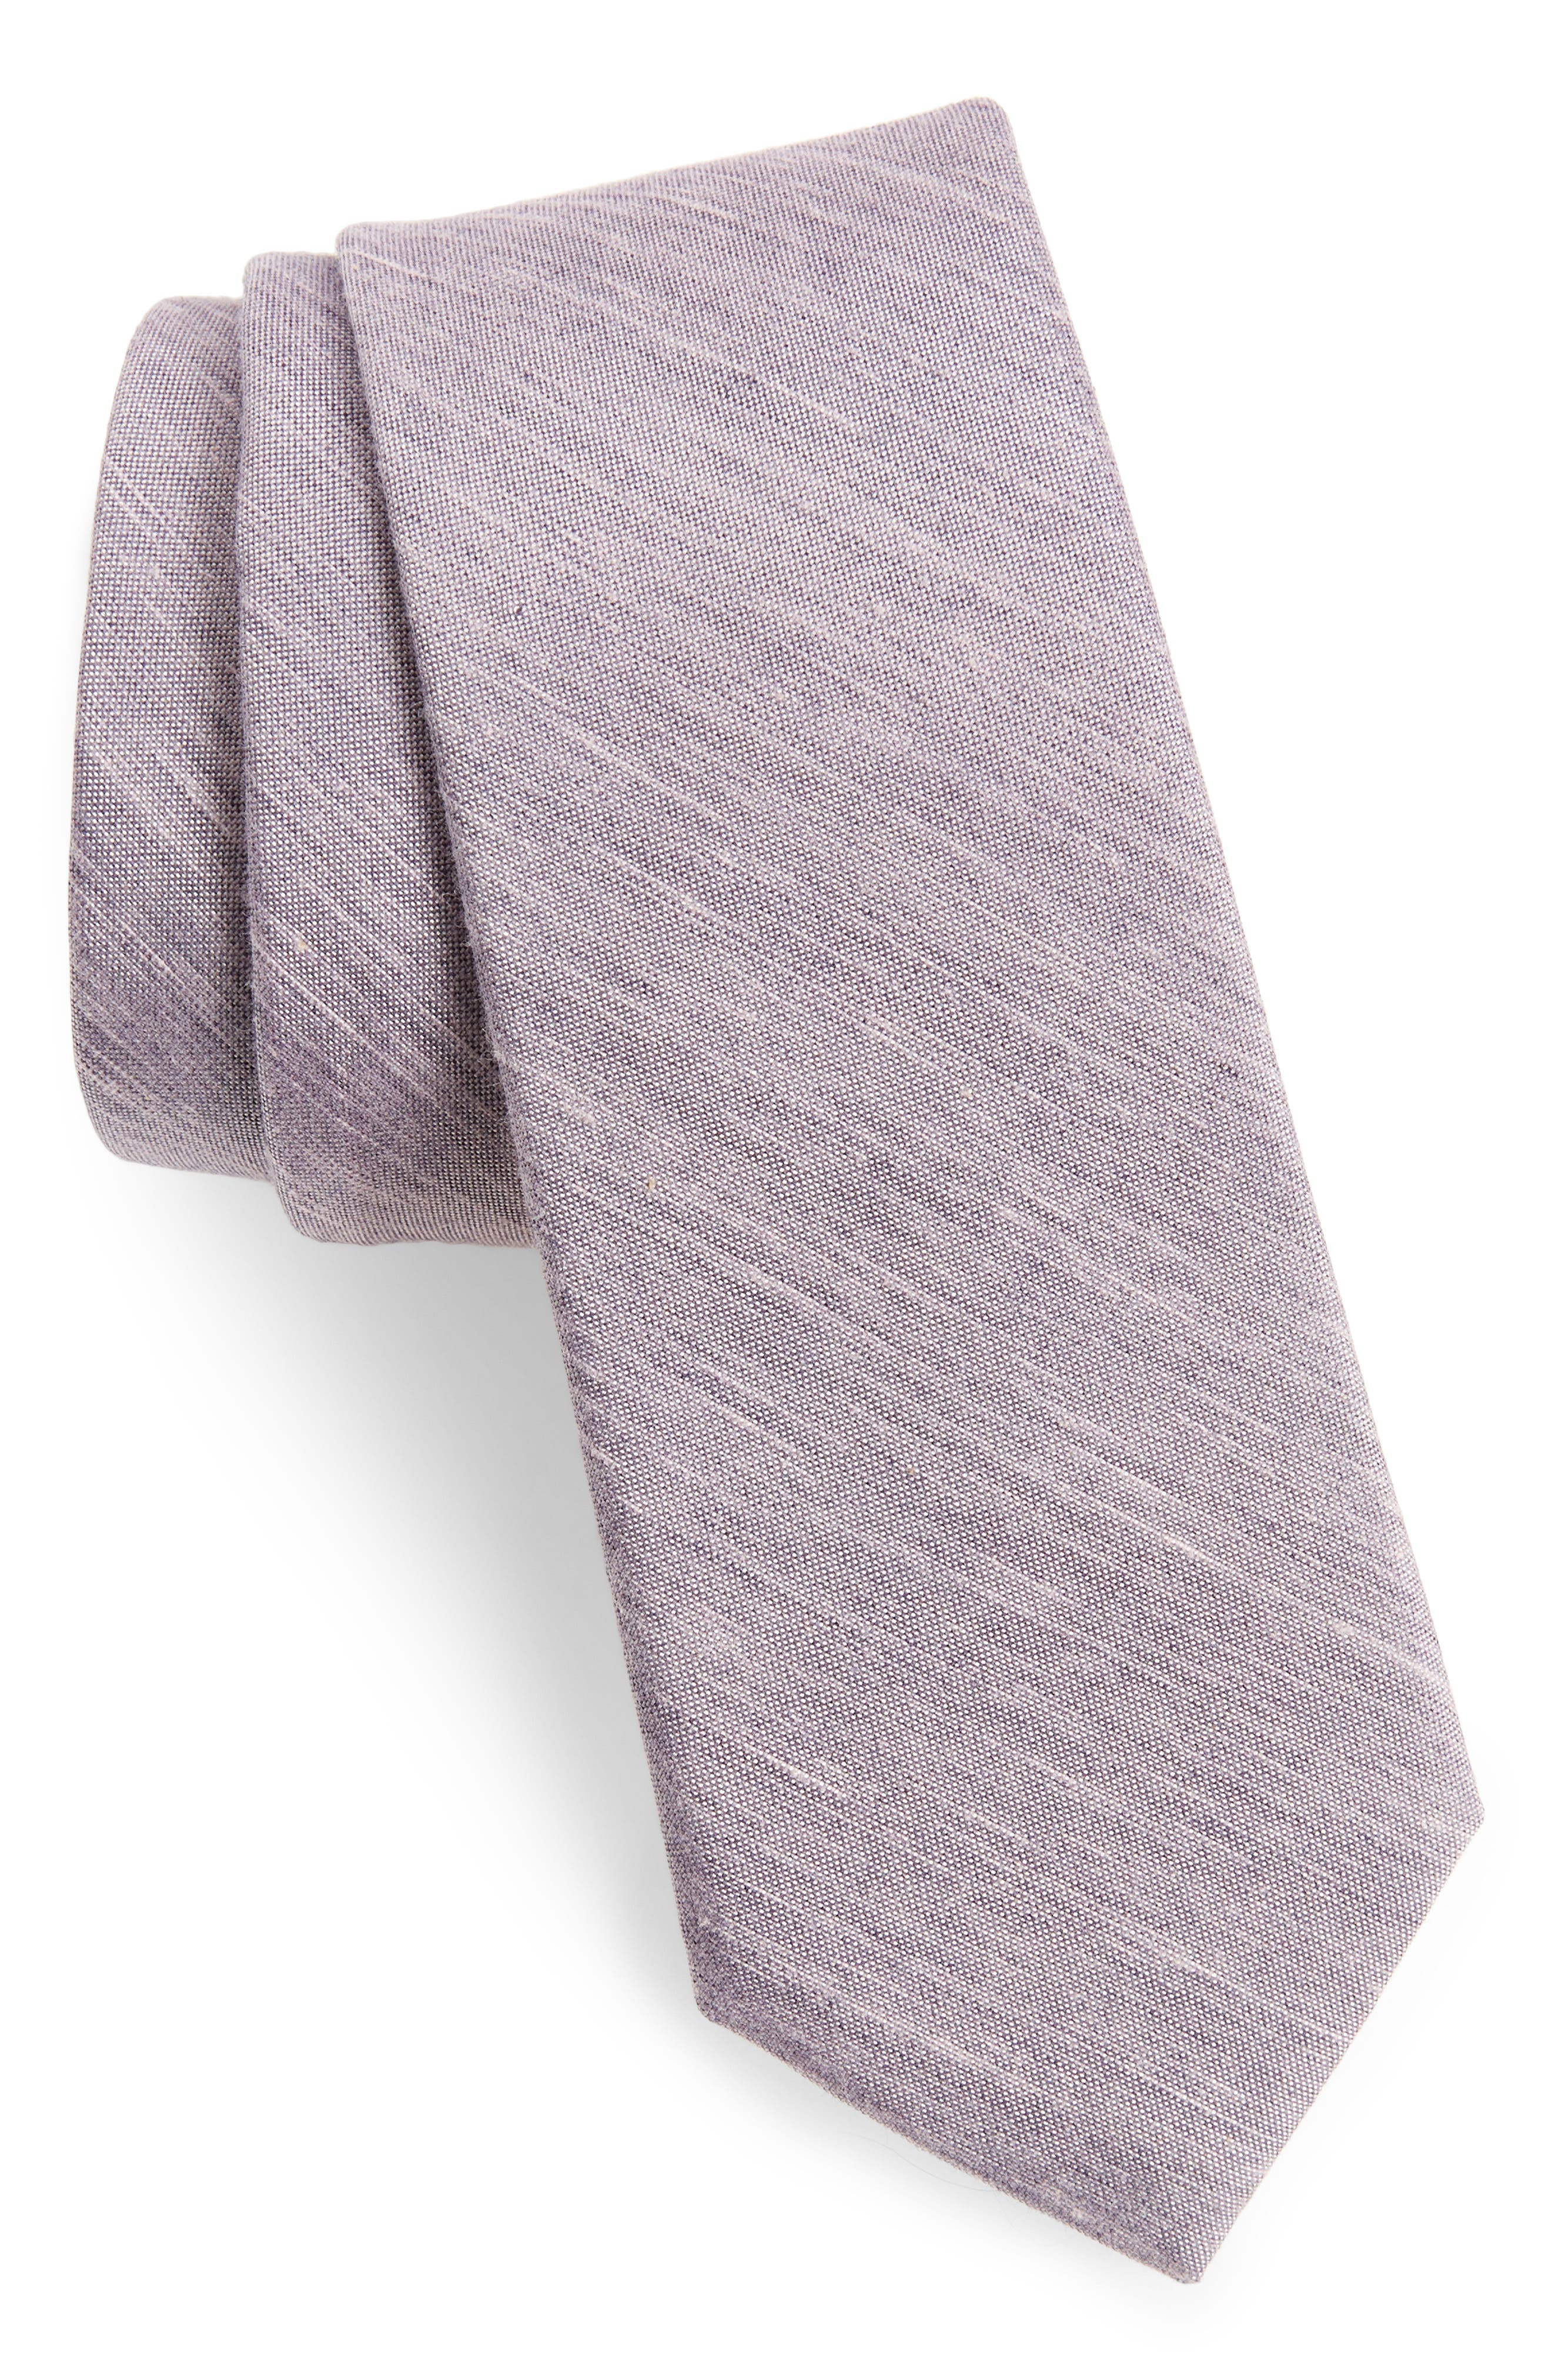 Marcus Solid Cotton Blend Tie,                         Main,                         color, Charcoal